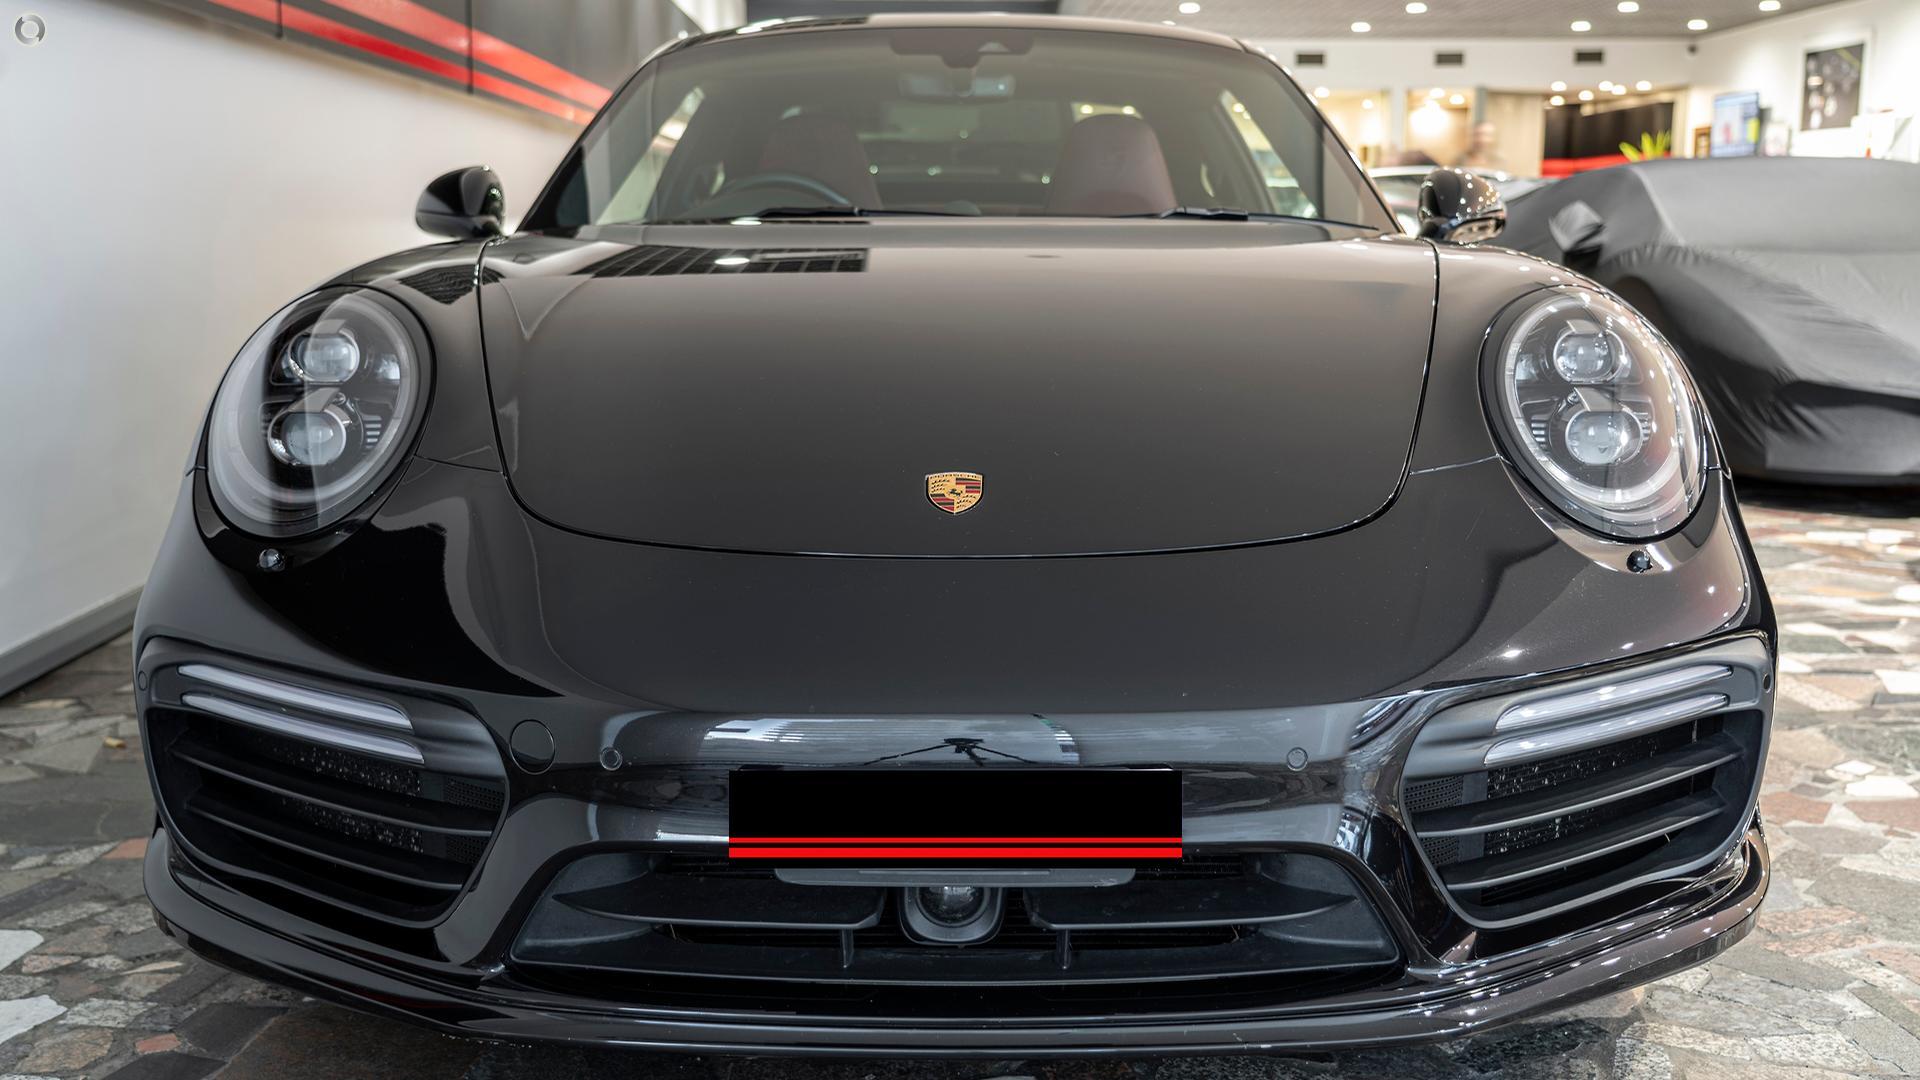 2016 Porsche 911 Turbo S 991